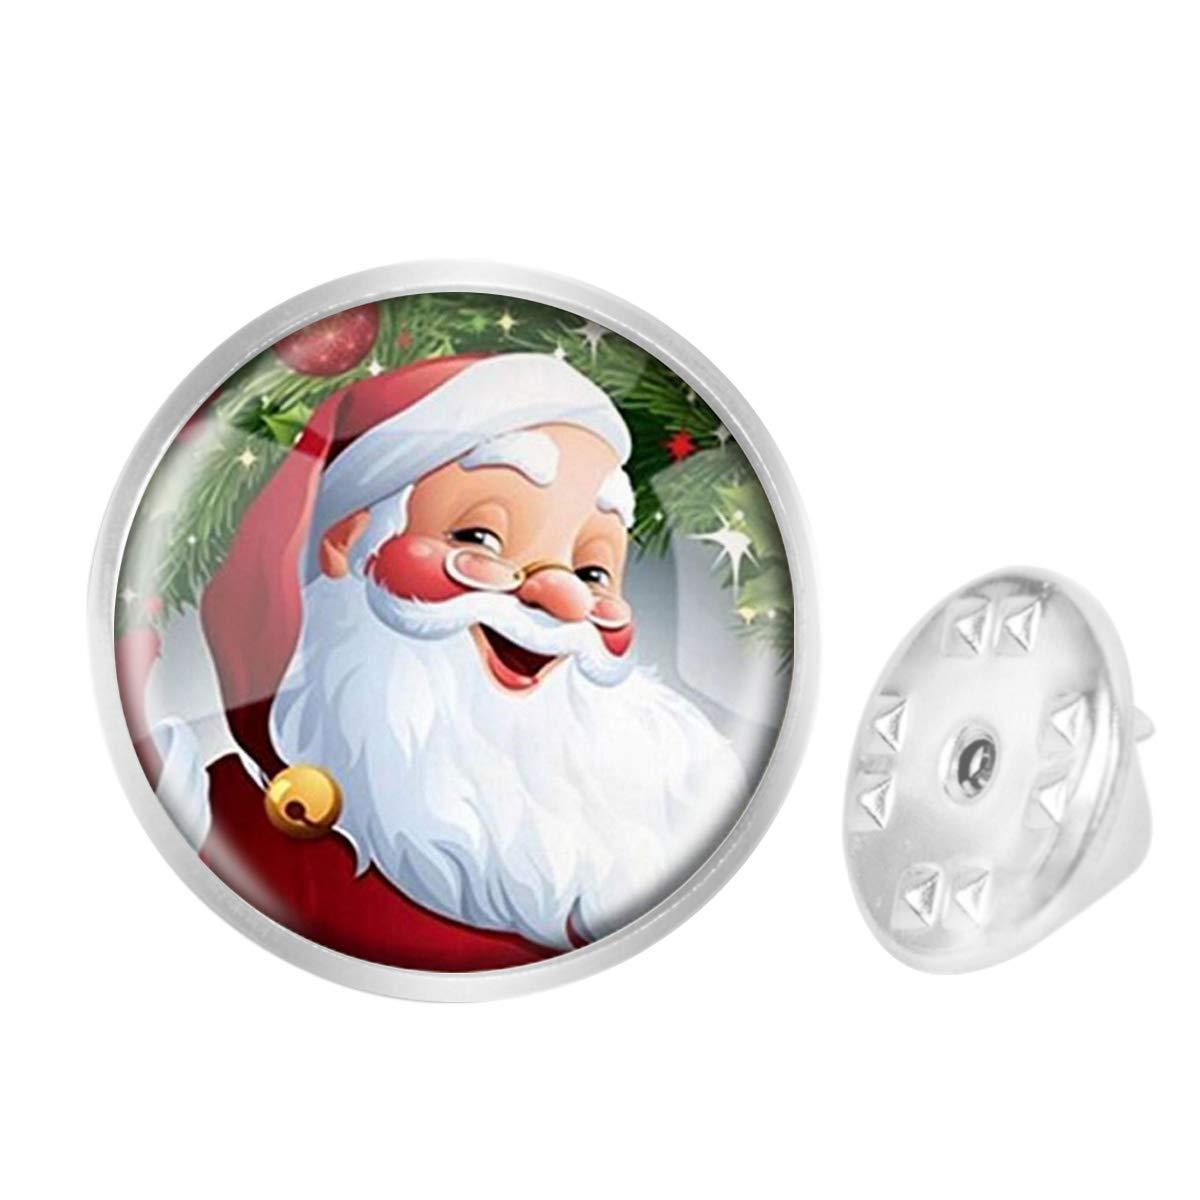 WAZZIT Round Metal Tie Tack Hat Lapel Pin Brooches Santa Christmas Banquet Badge Enamel Pins Trendy Accessory Jacket T-Shirt